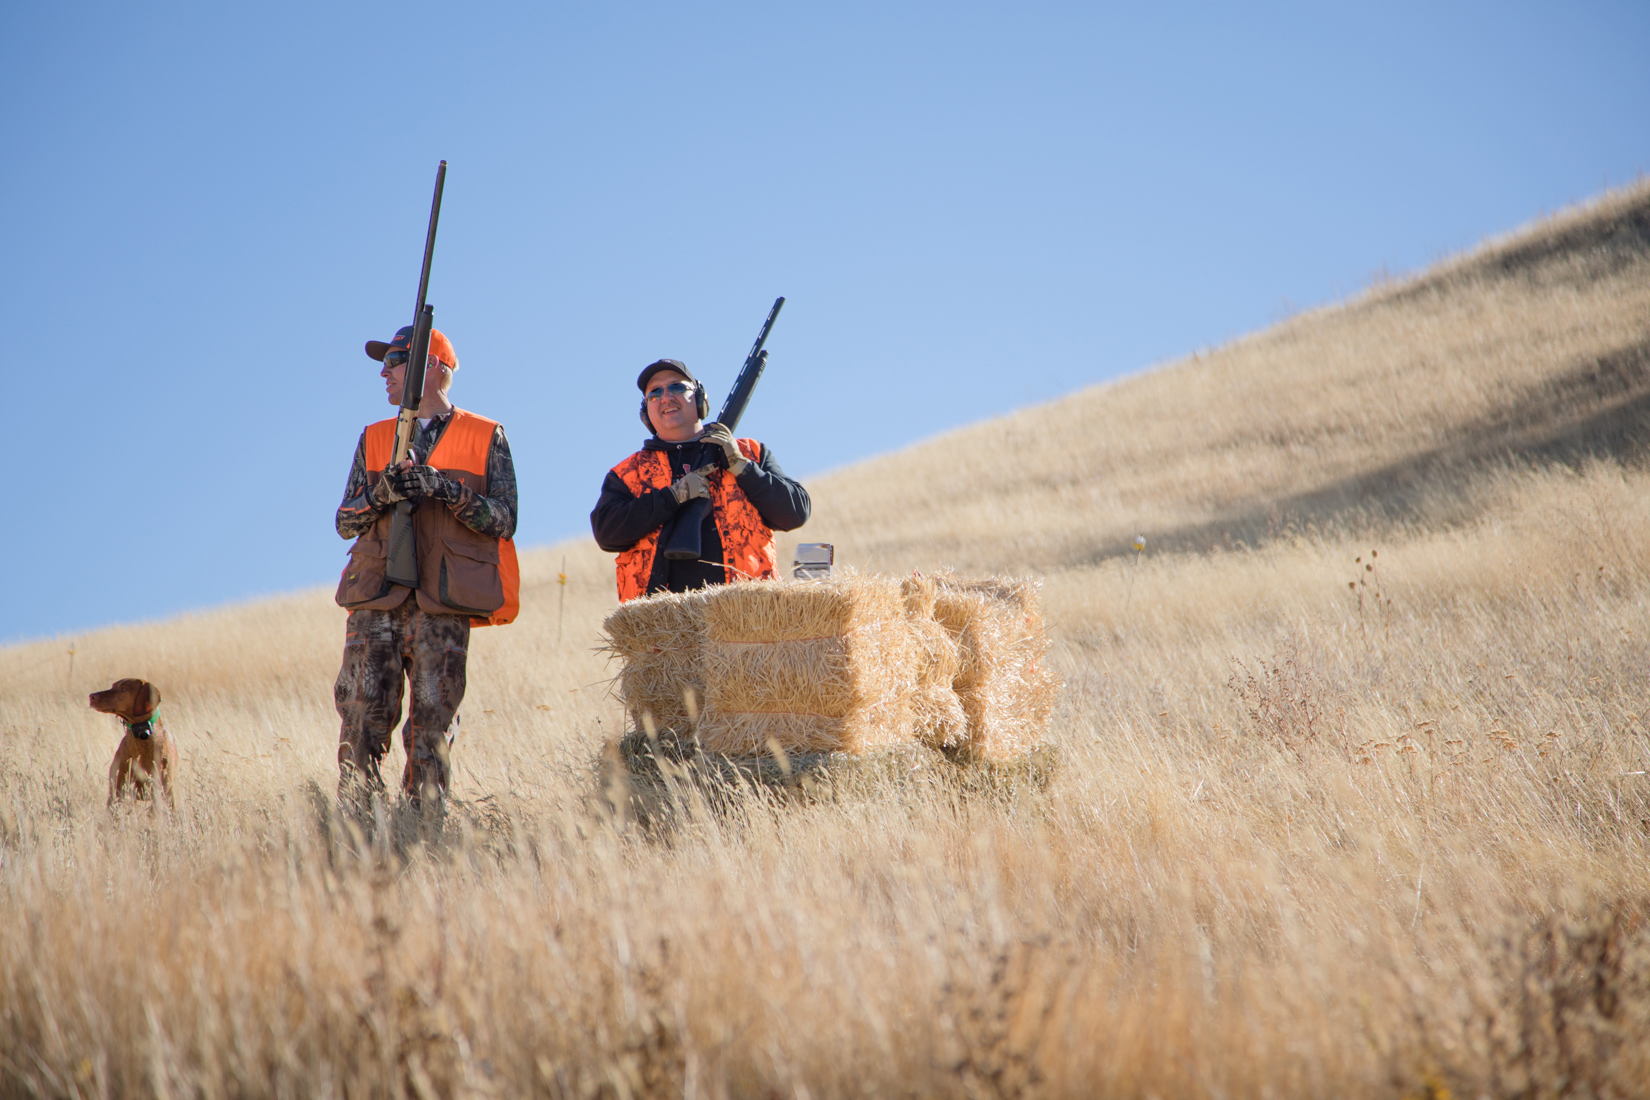 Taking Aim in Montana